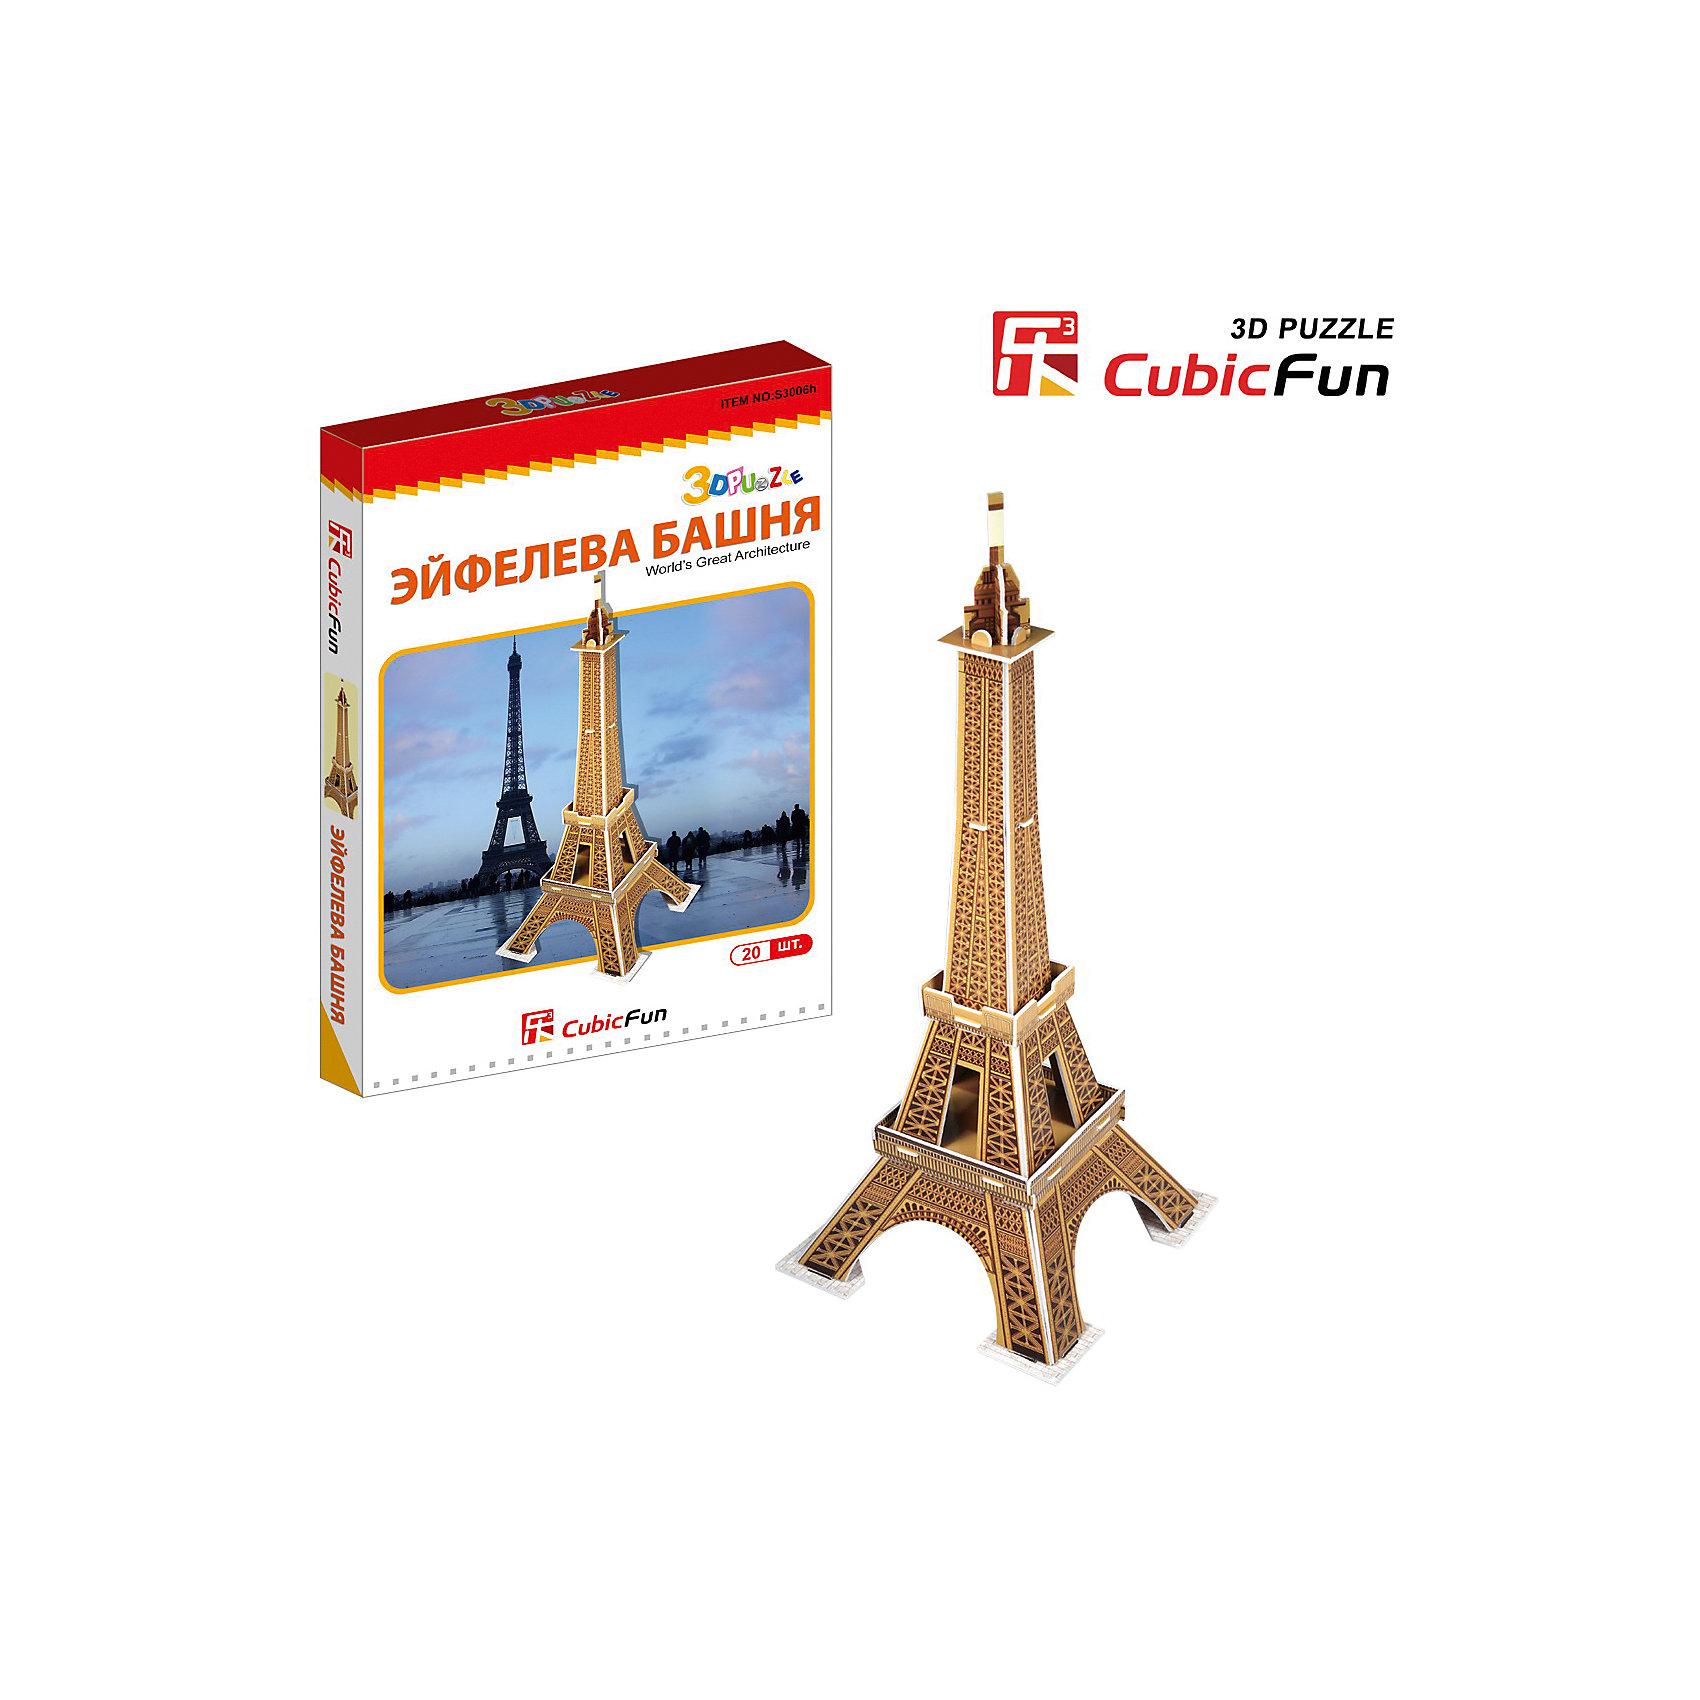 CubicFun Пазл 3D Эйфелева башня (Франция) (мини серия), CubicFun конструкторы cubicfun 3d пазл эйфелева башня 2 франция